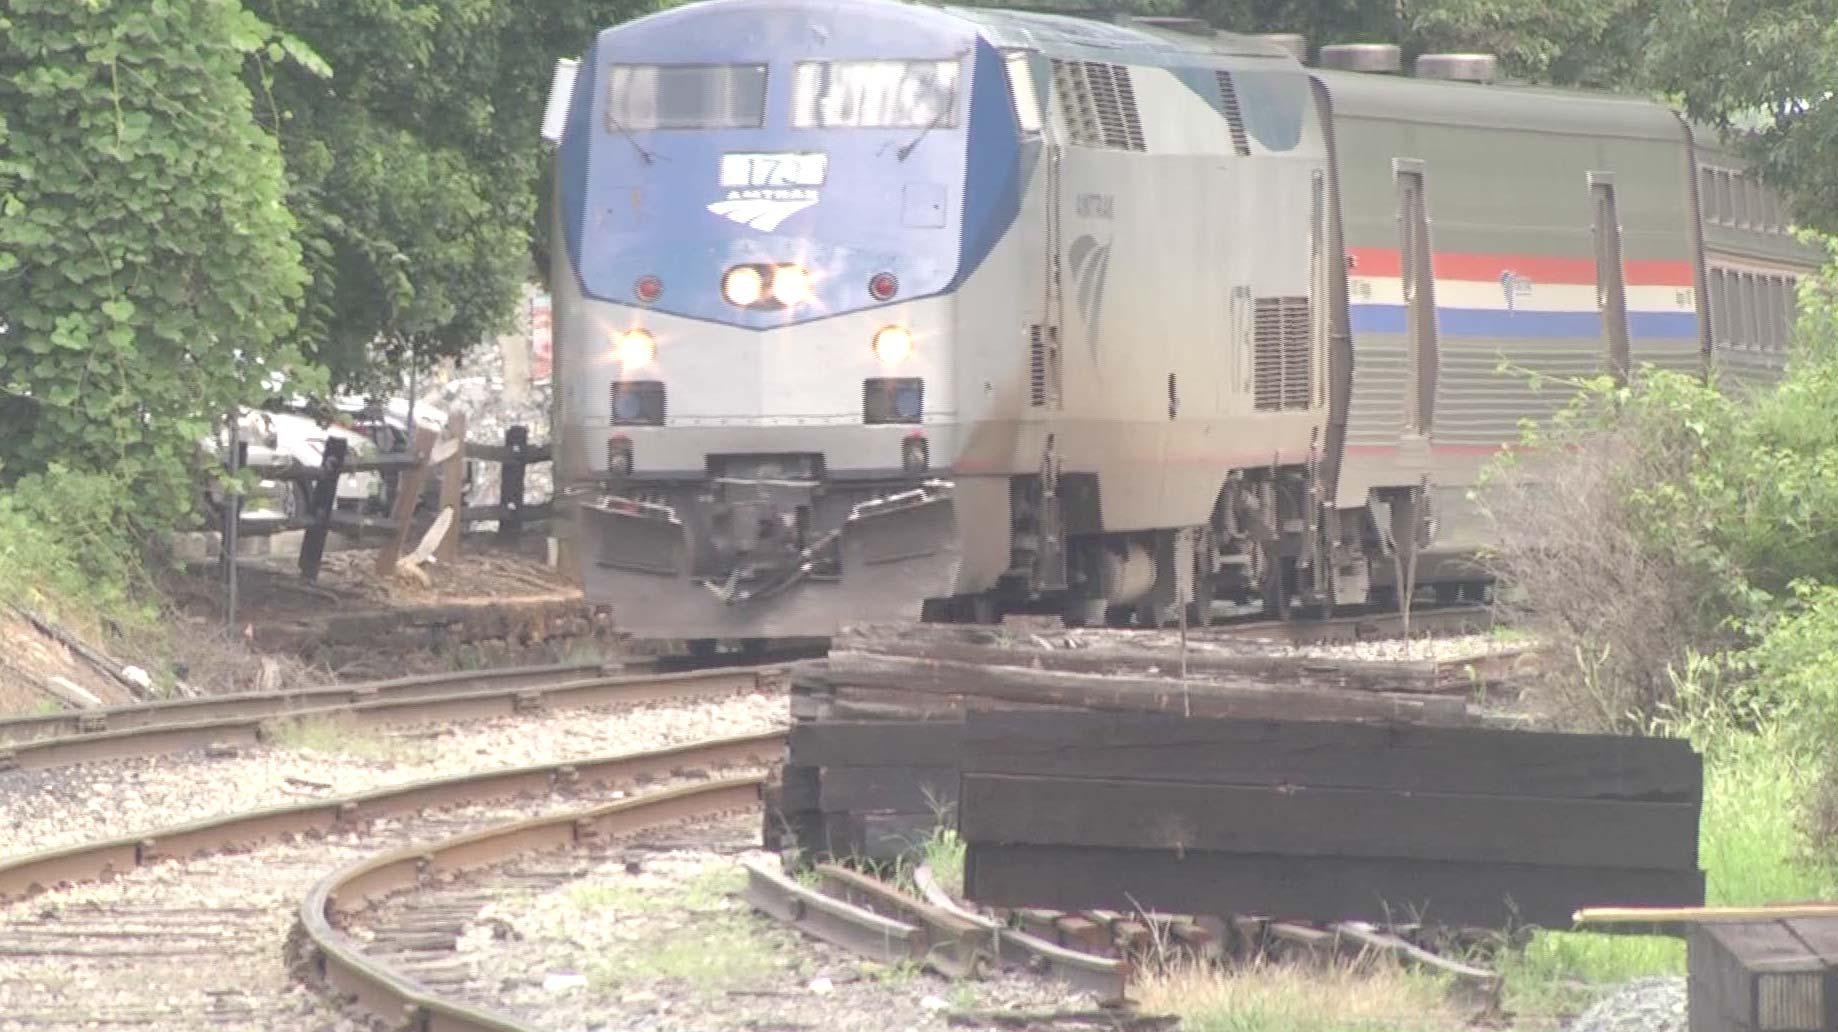 An Amtrak train arriving in Charlottesville